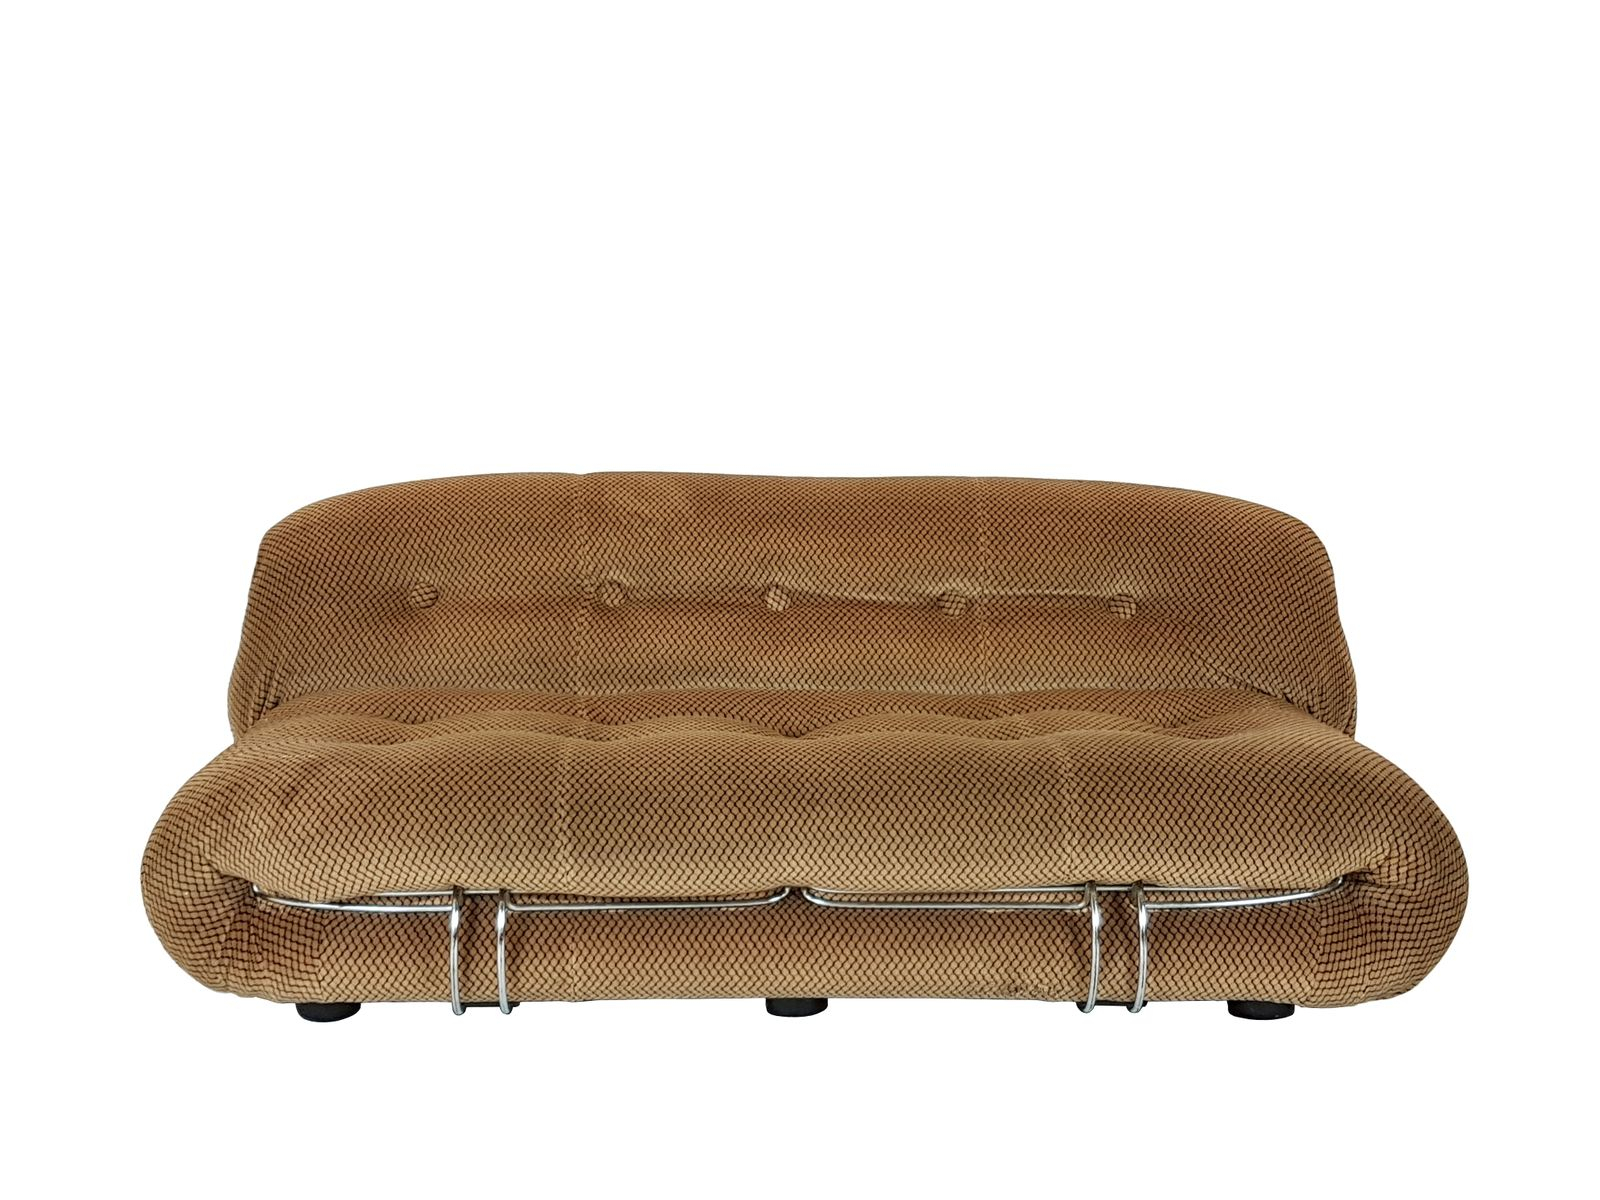 Optical Model Soriana Velvet Sofaafra & Tobia Scarpa For Cassina Inside London Optical Sofa Chairs (Image 24 of 25)